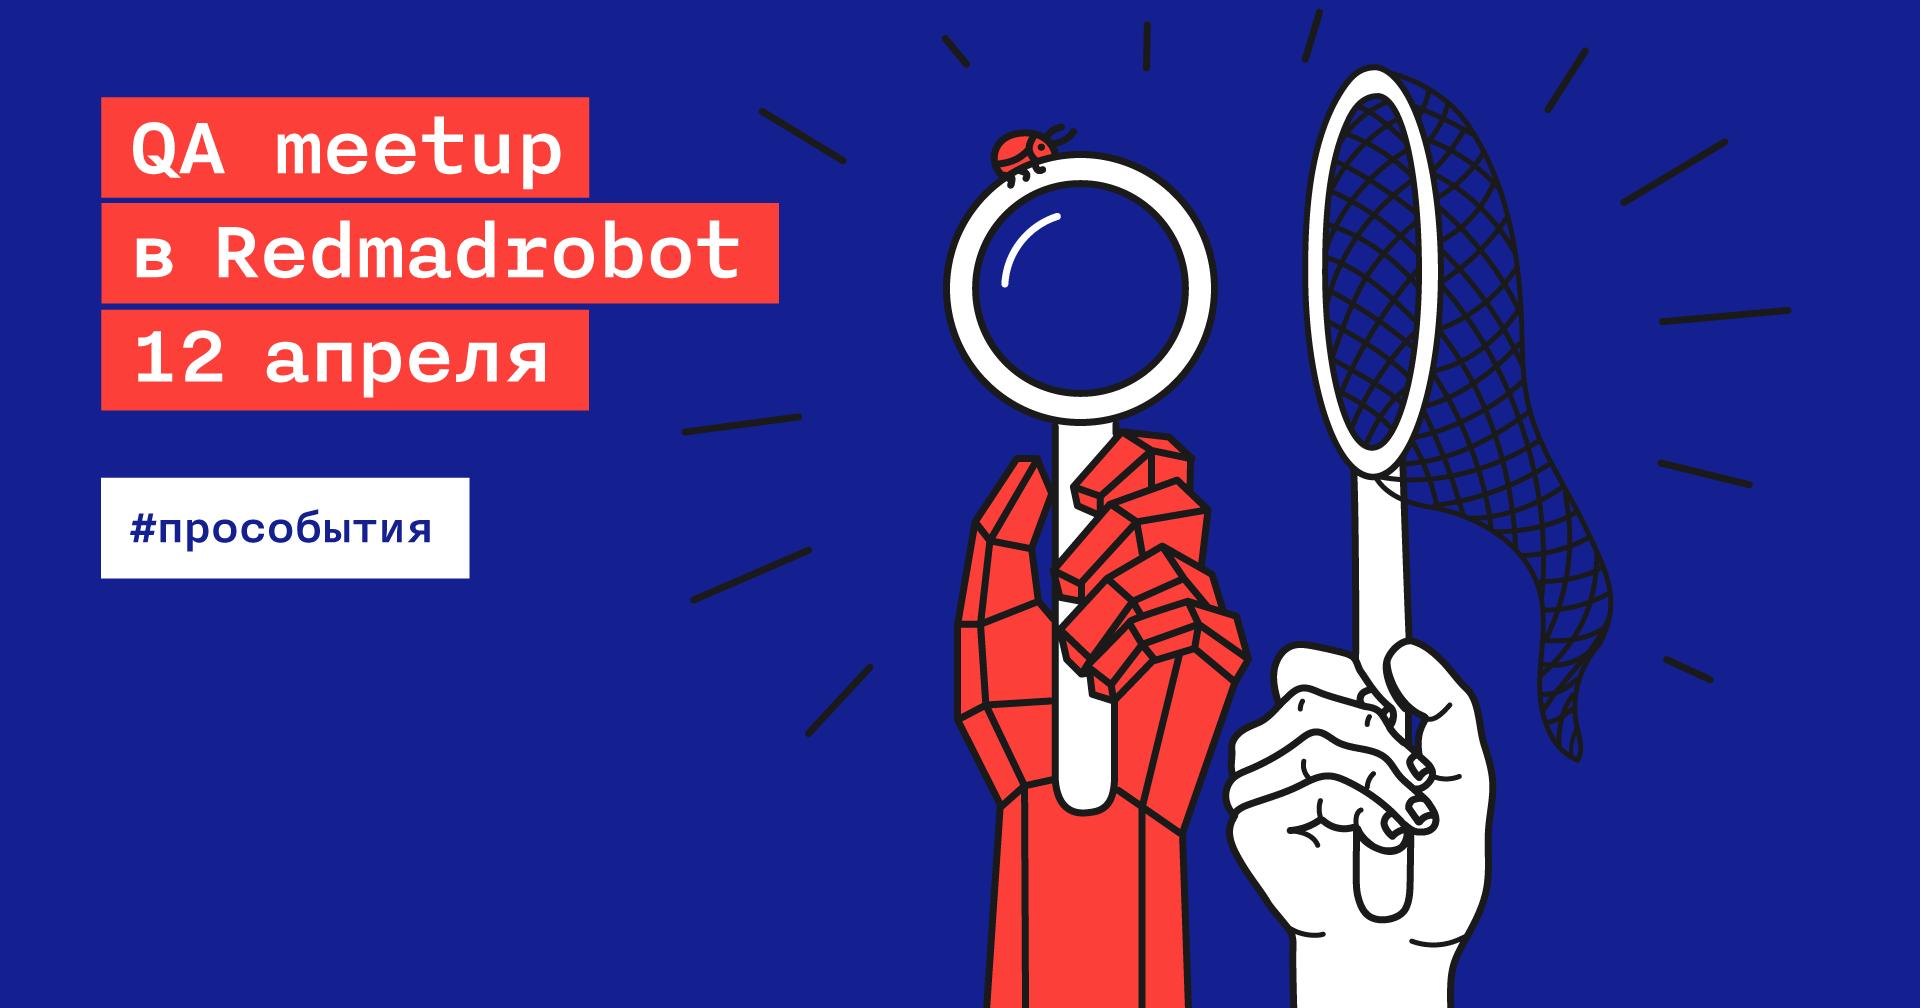 QA-митап 12 апреля в Redmadrobot